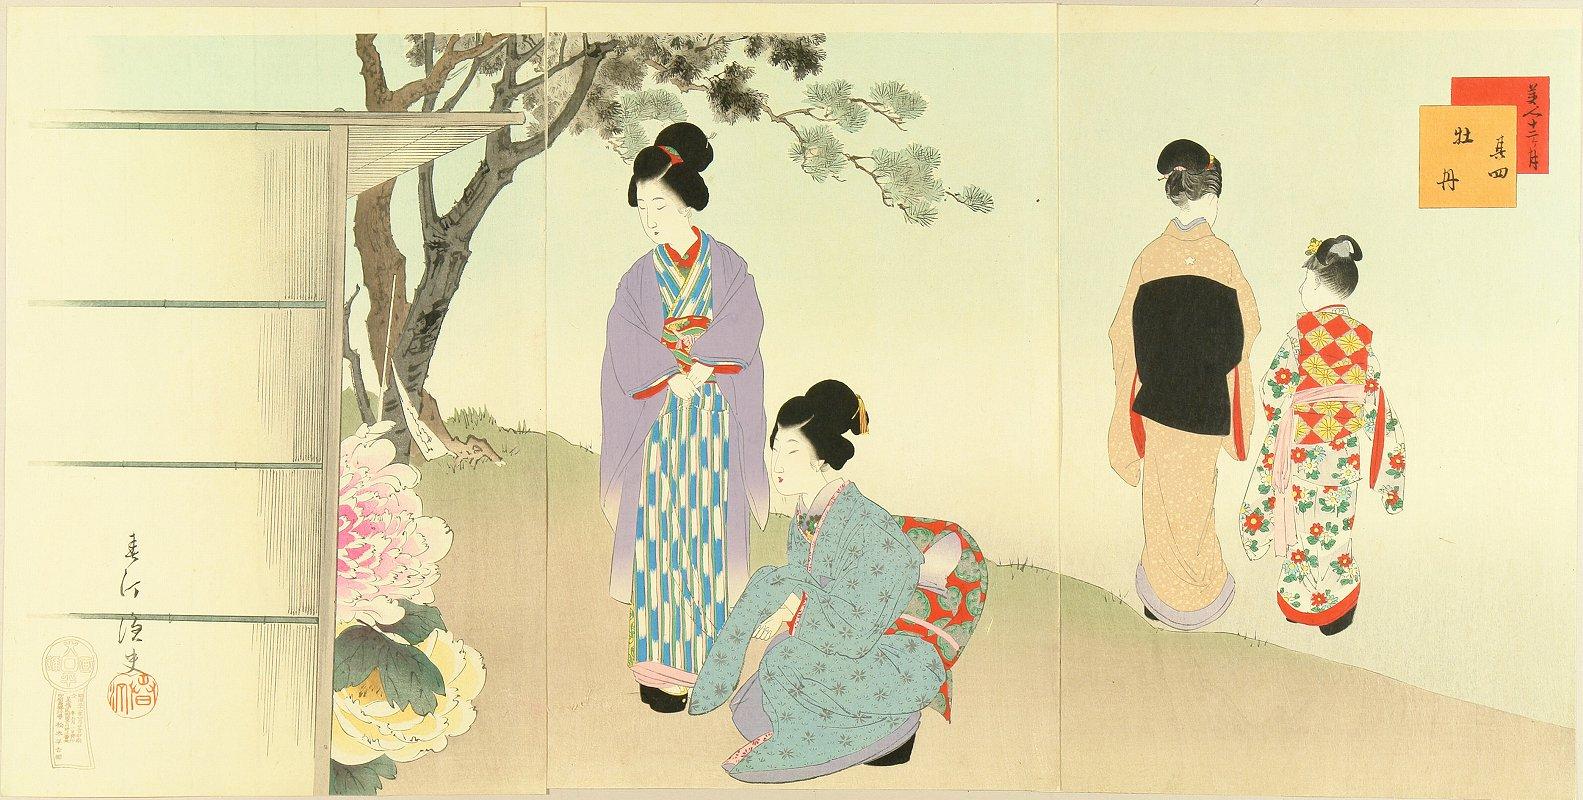 SHUNTEI <i>Botan</i> (Peony), fourth month, from <i>Bijin junikagetsu</i> (Twelve month of beauties), triptych